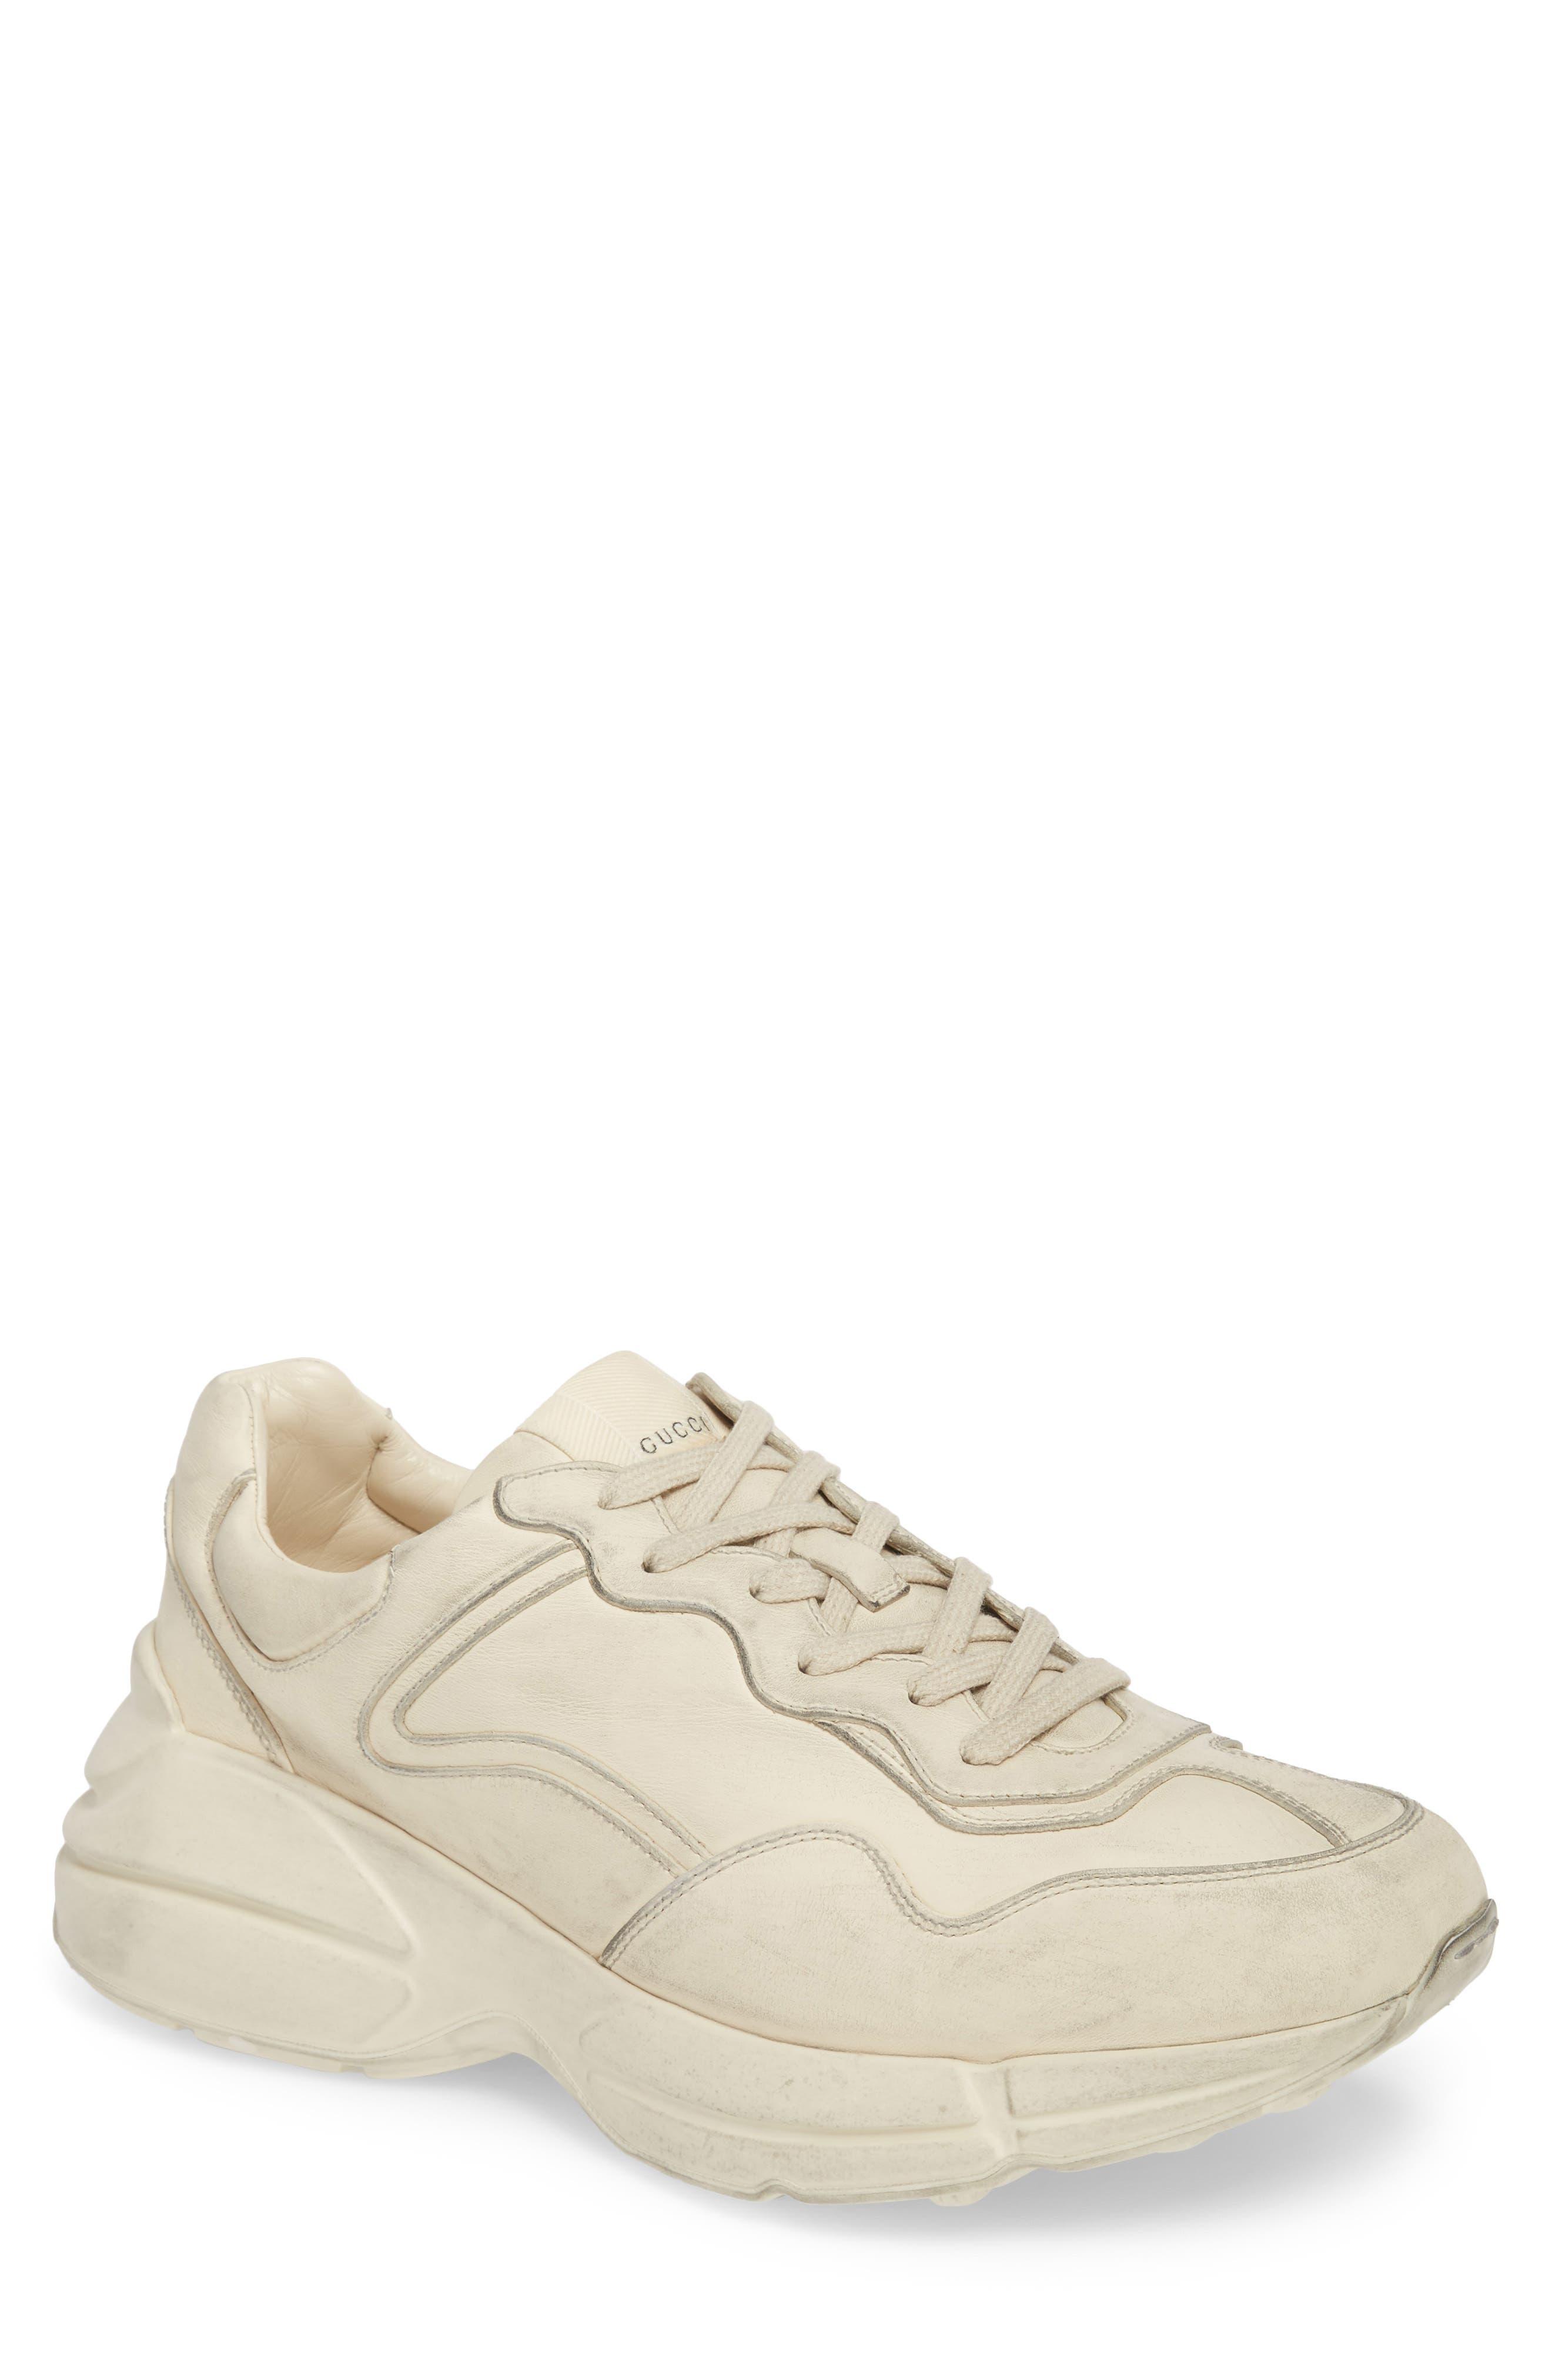 Rhyton Sneaker,                             Main thumbnail 1, color,                             Ivory White